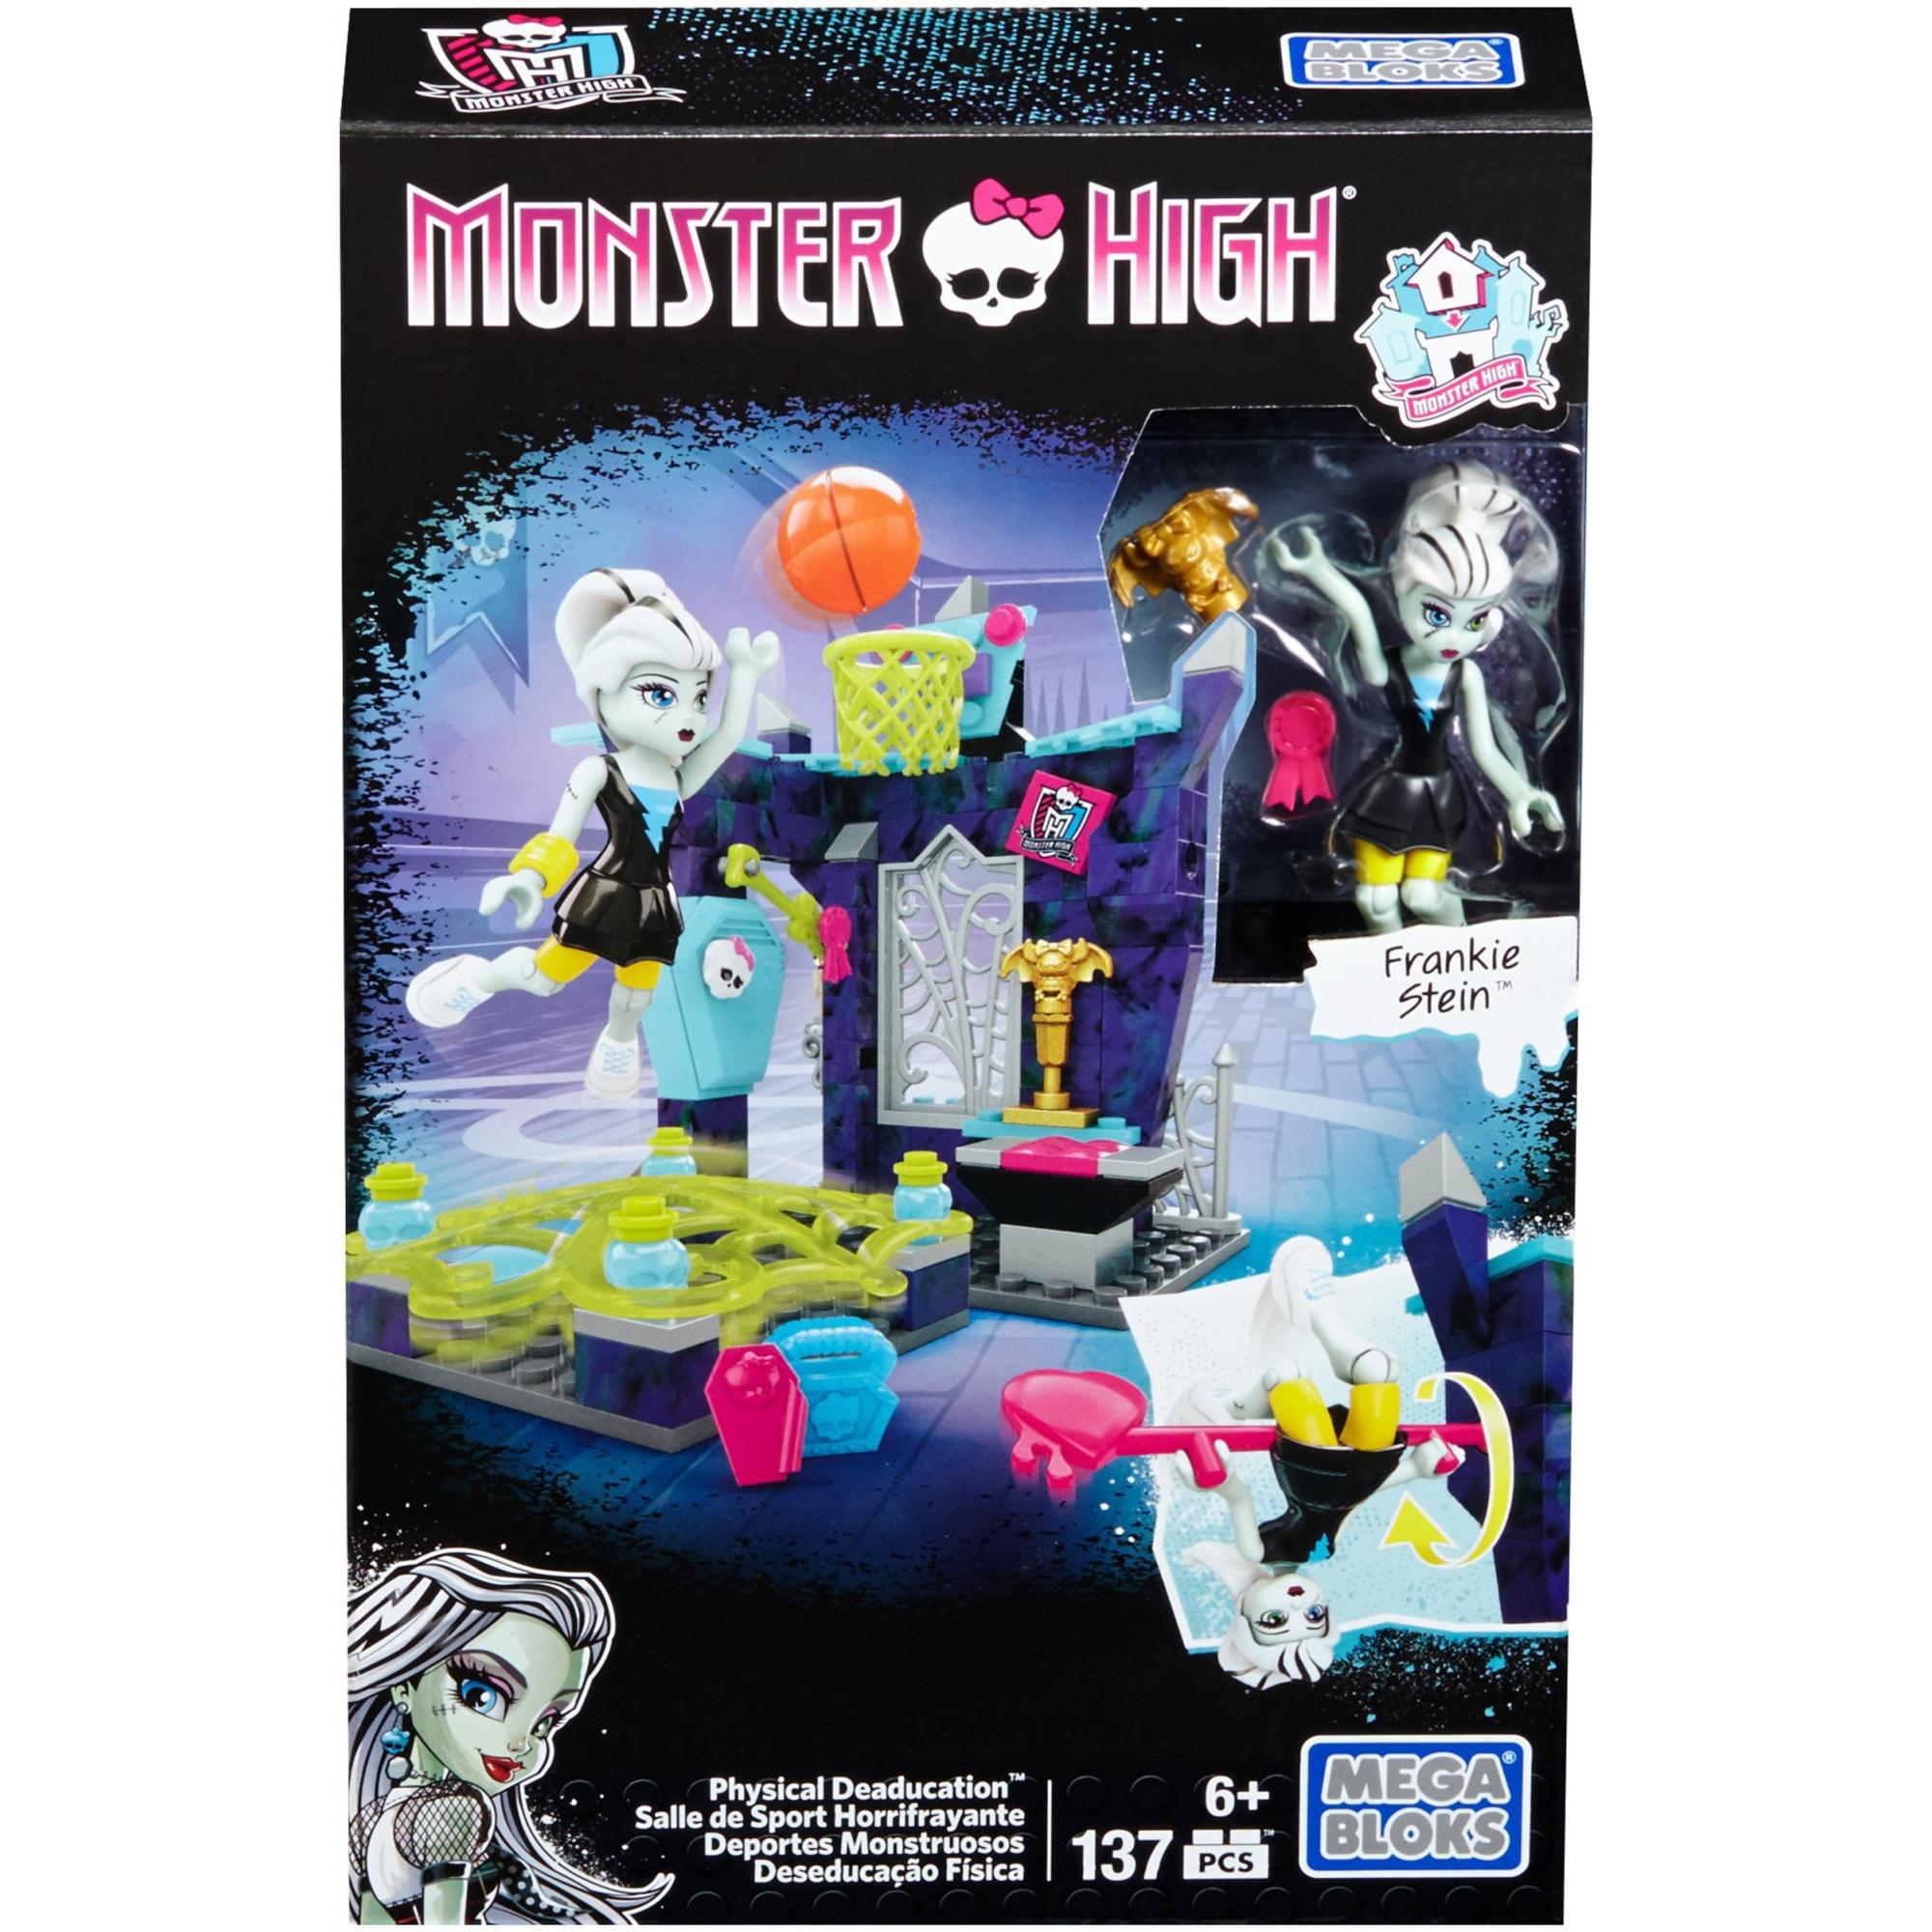 Mega Bloks Monster High Physical Deaducation Frankie Stein Doll by MATTEL INC.